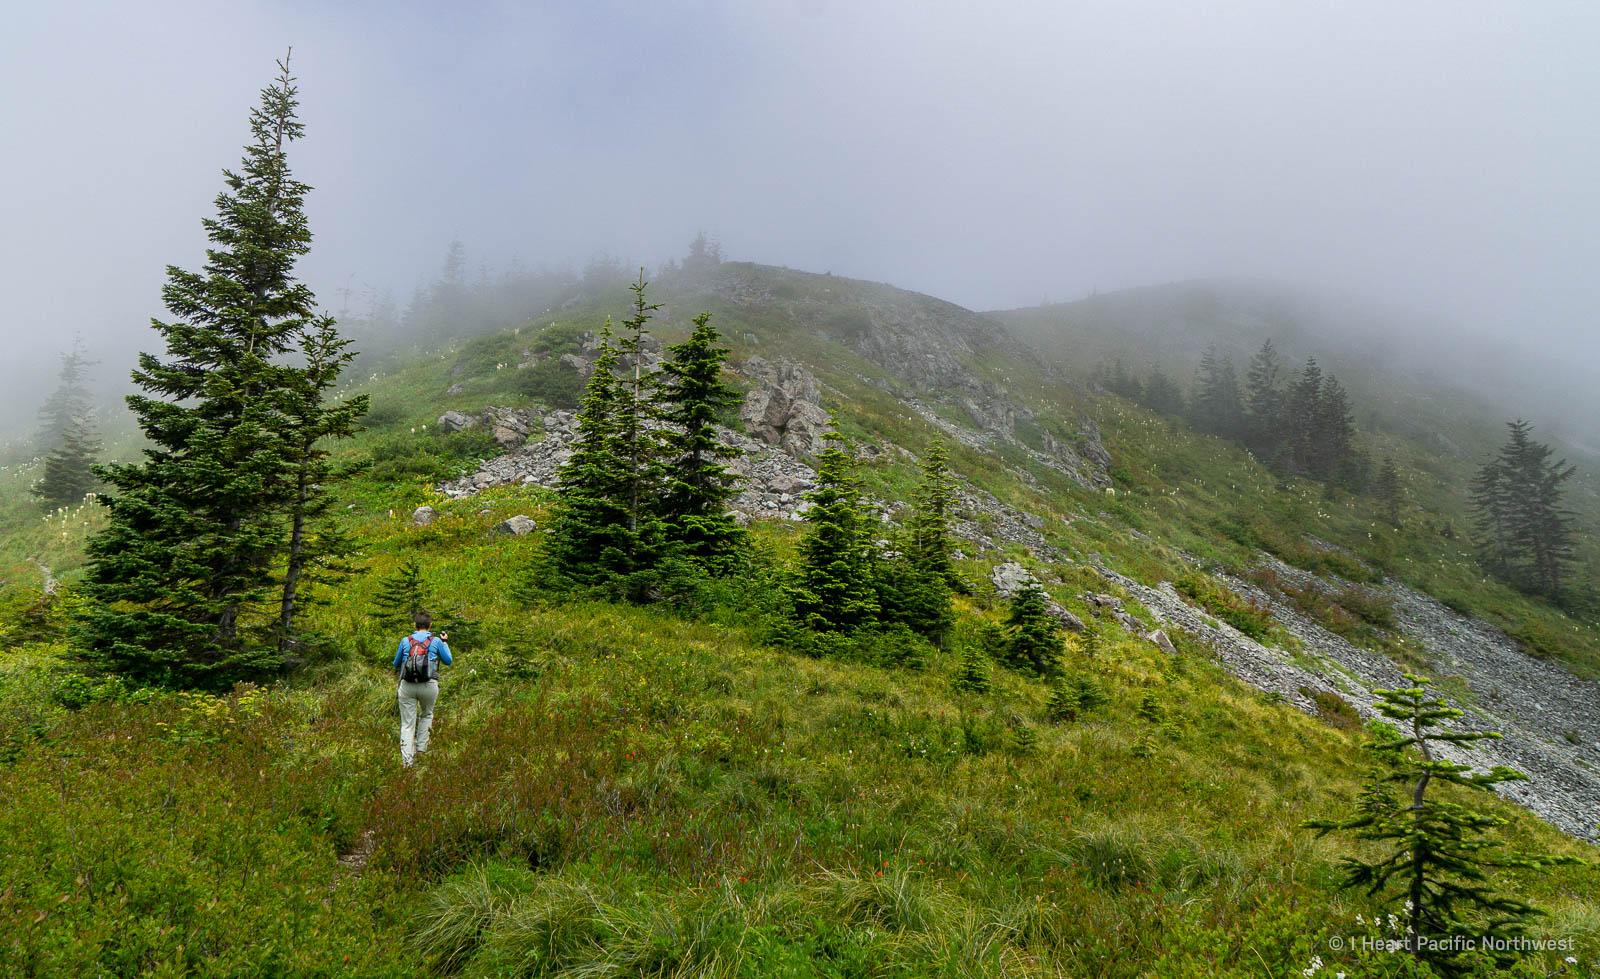 Silver Star Mountain hike via Grouse Vista trailhead